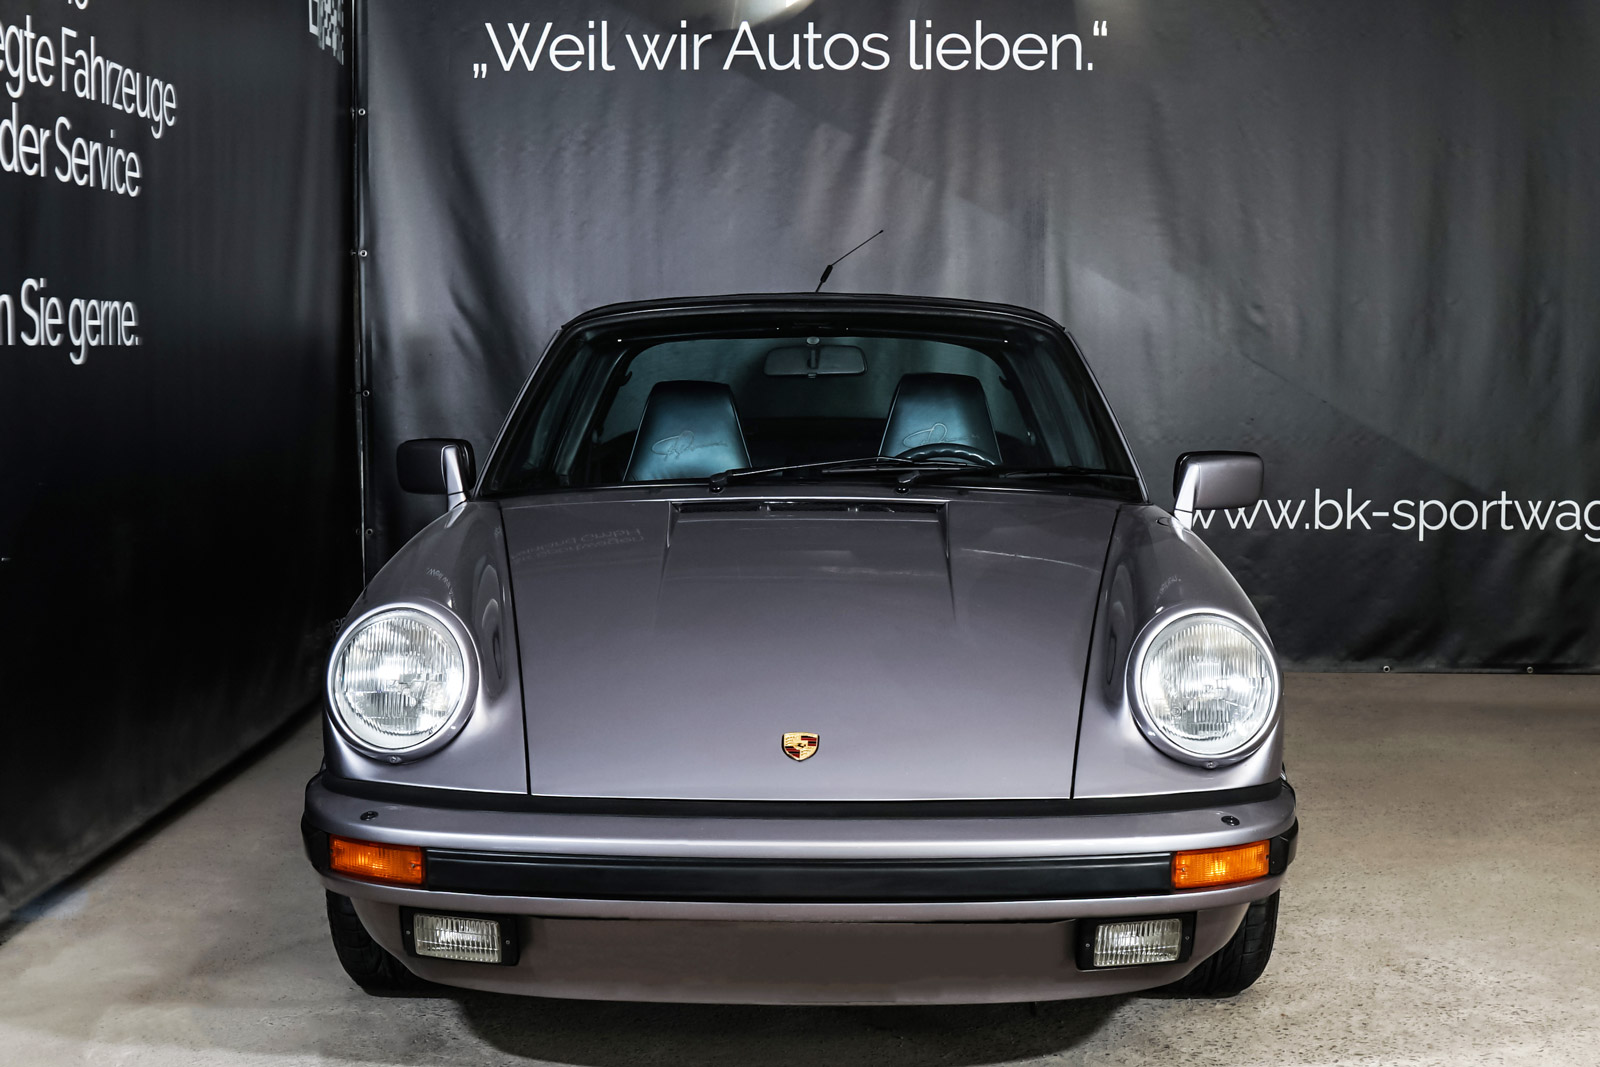 Porsche_911_Targa_Diamantblaumetallic_Blau_POR-0092_1_w